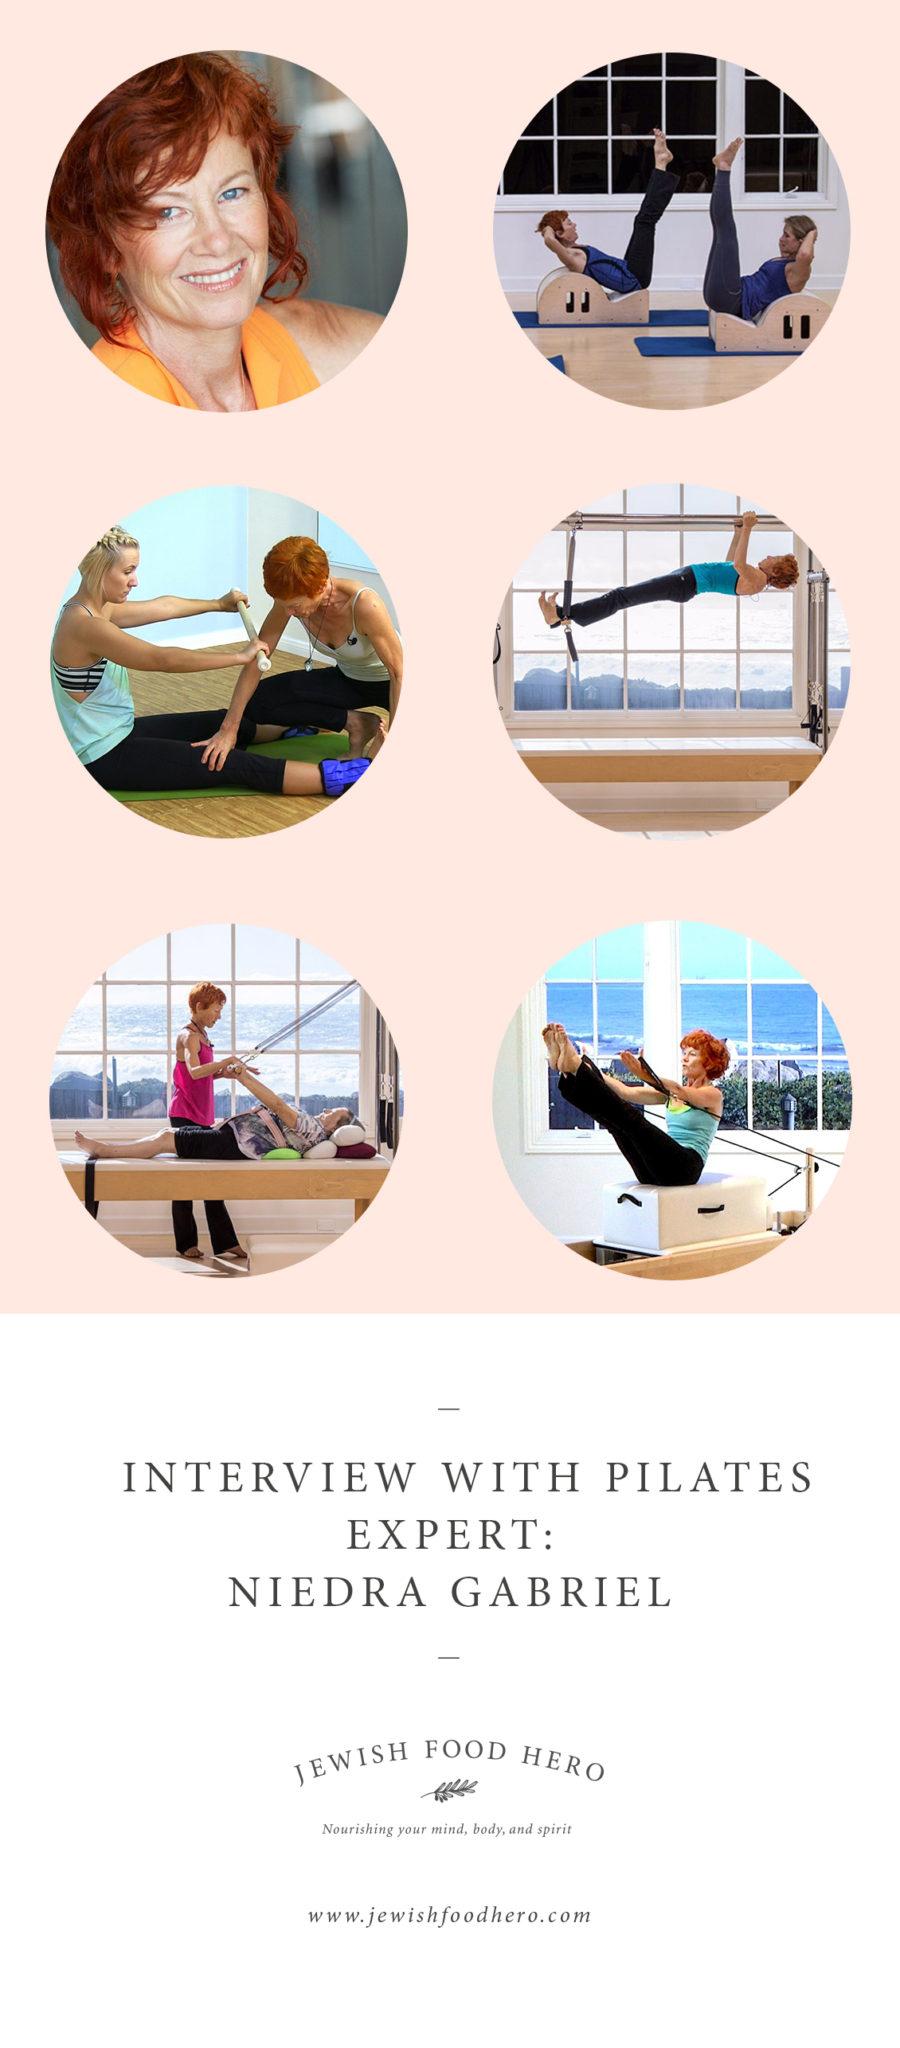 Pilates expert, pilates advice and tips, Niedra Gabriel